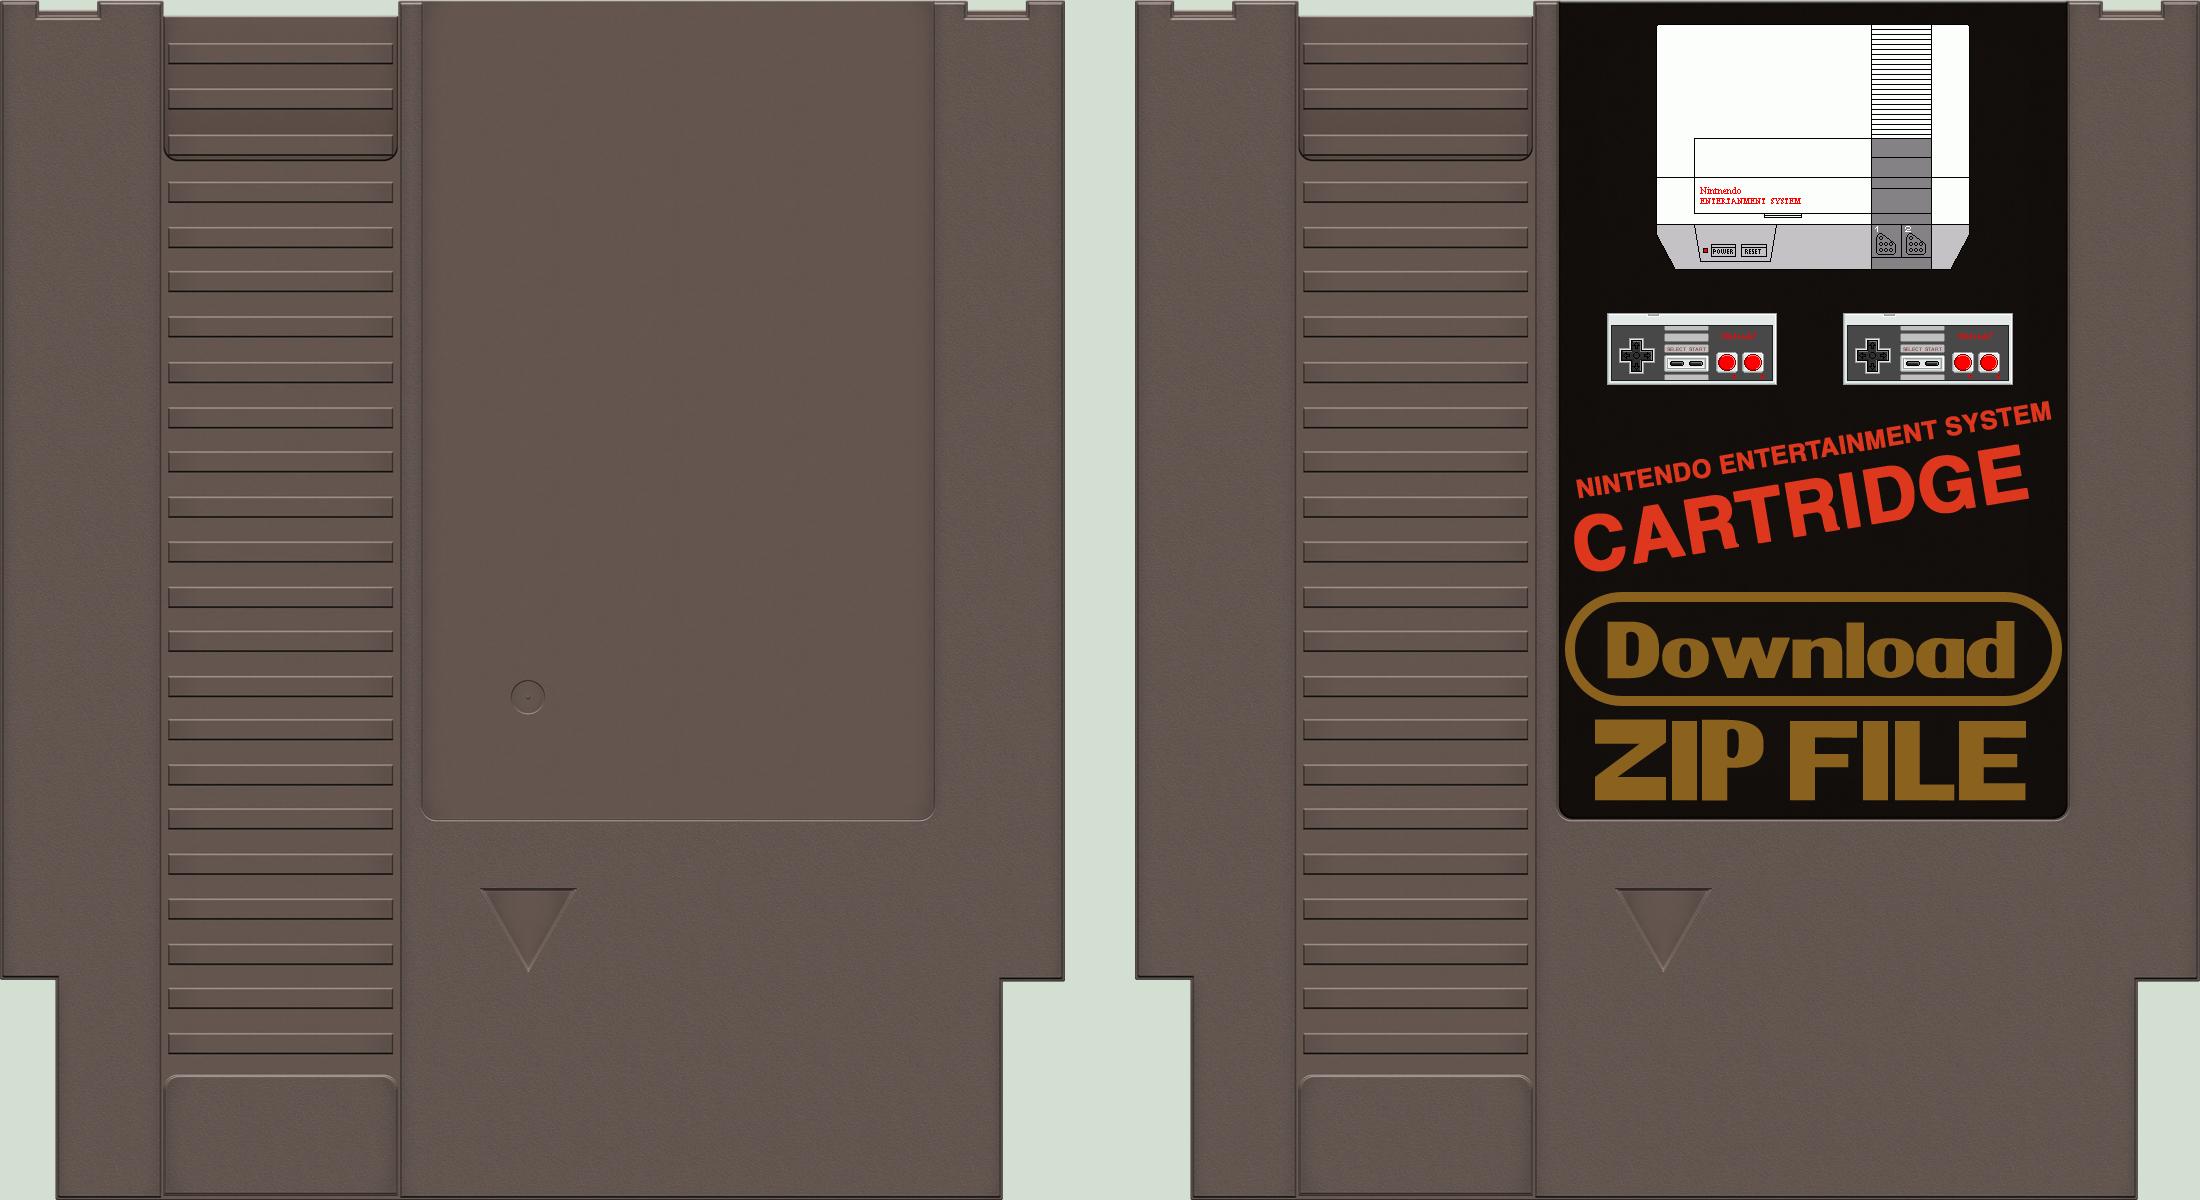 NES Cartridge by BLUEamnesiac on DeviantArt